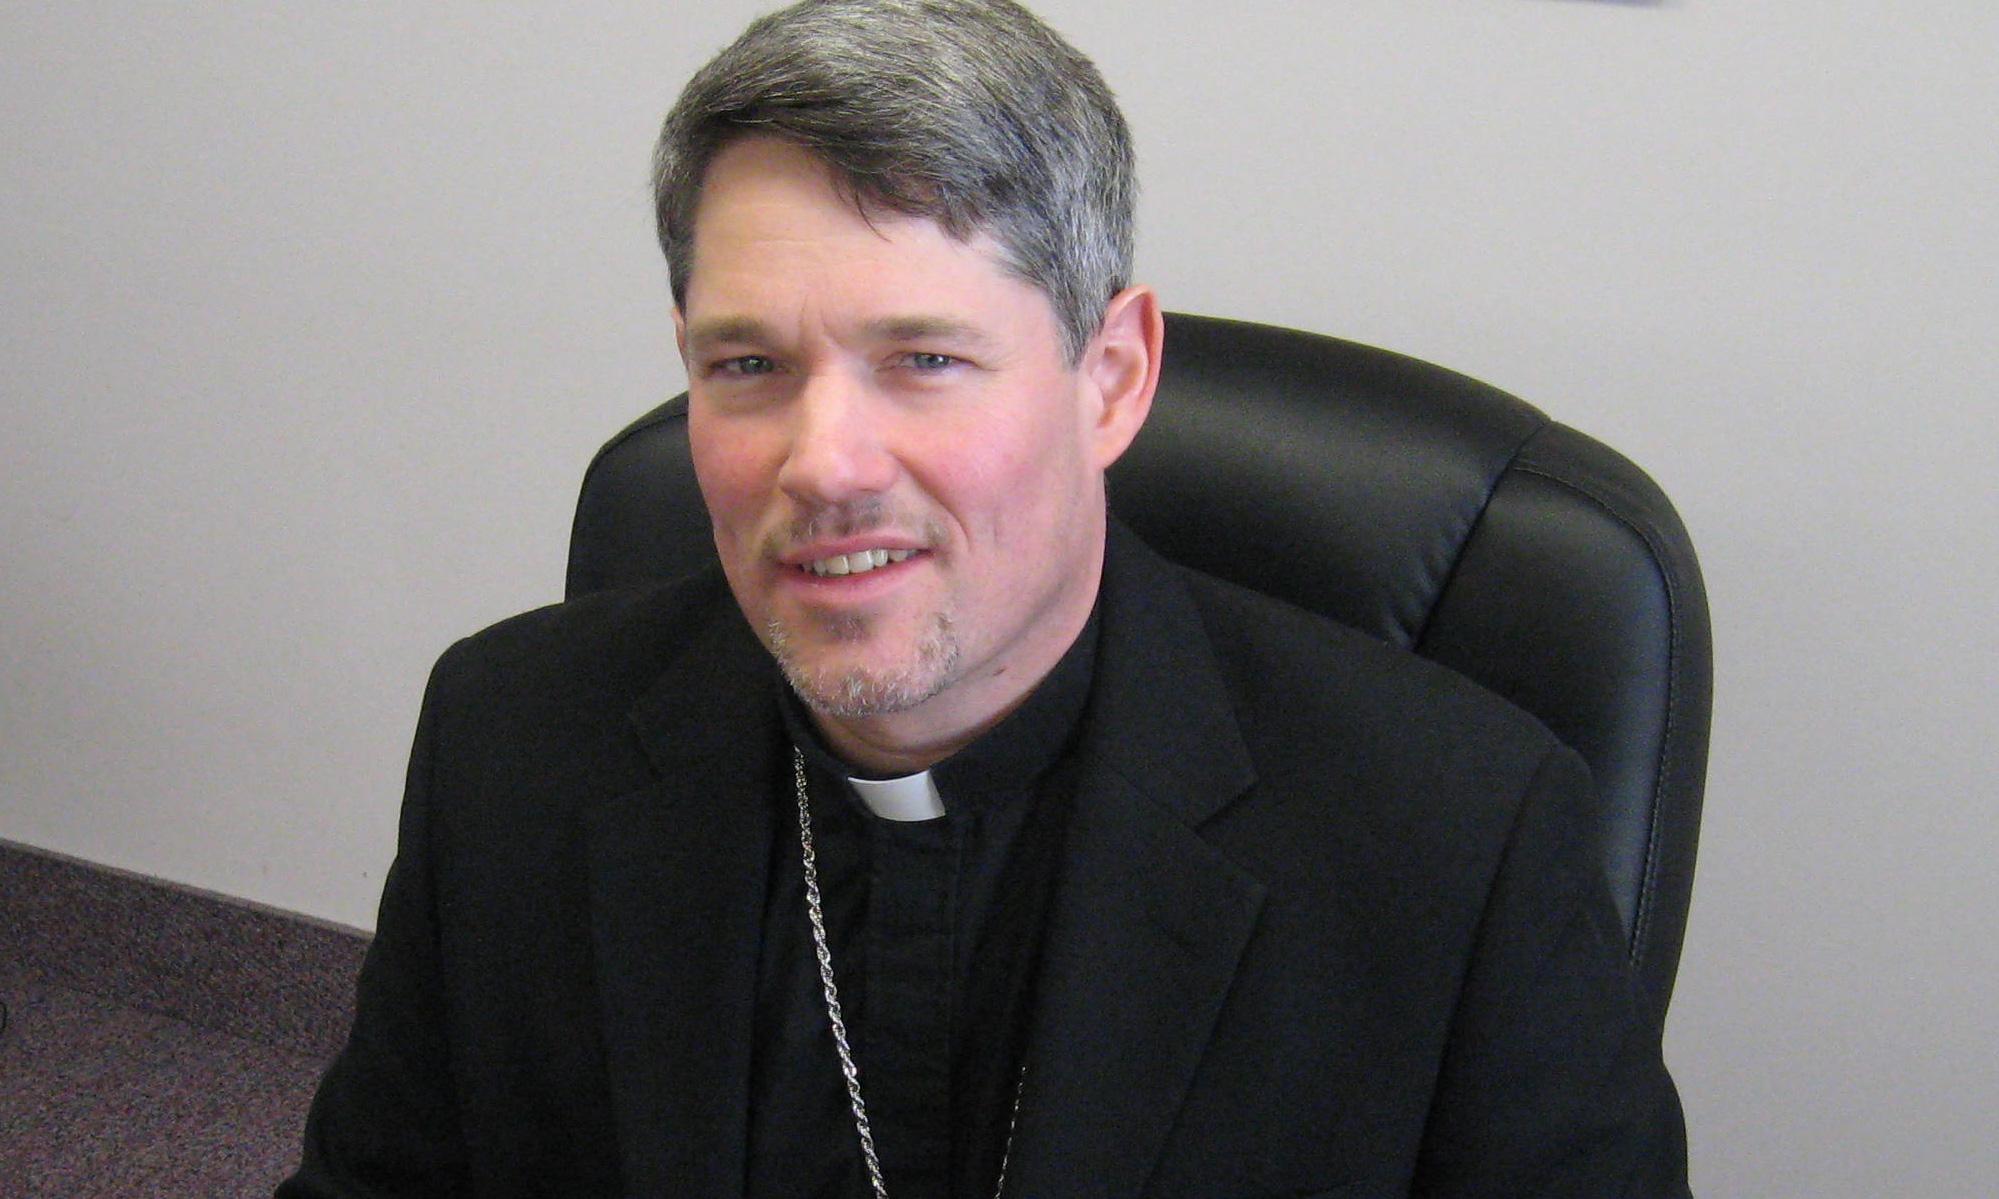 'The agenda is the needs of the people', says new Saint John bishop - Grandin Media